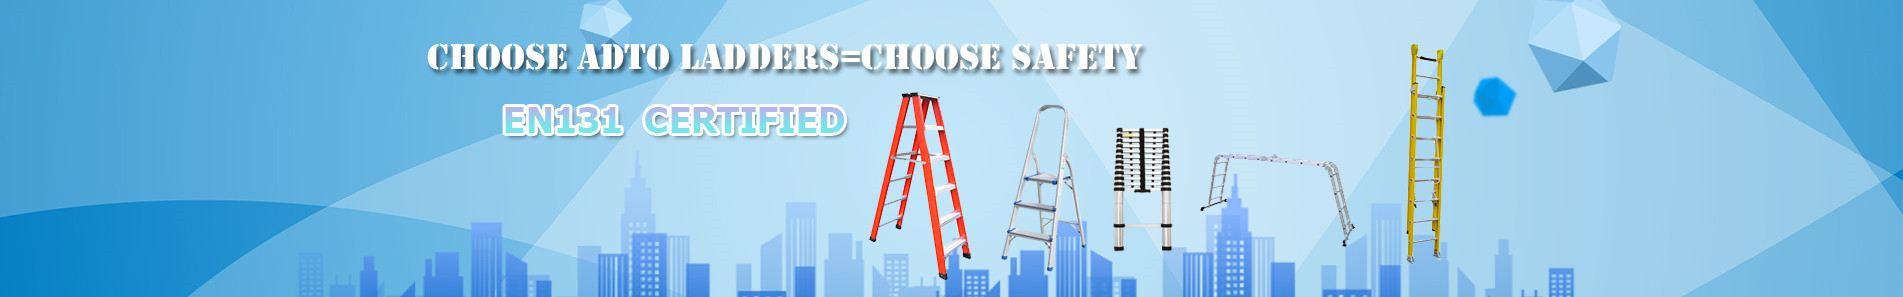 step-stool-ladder